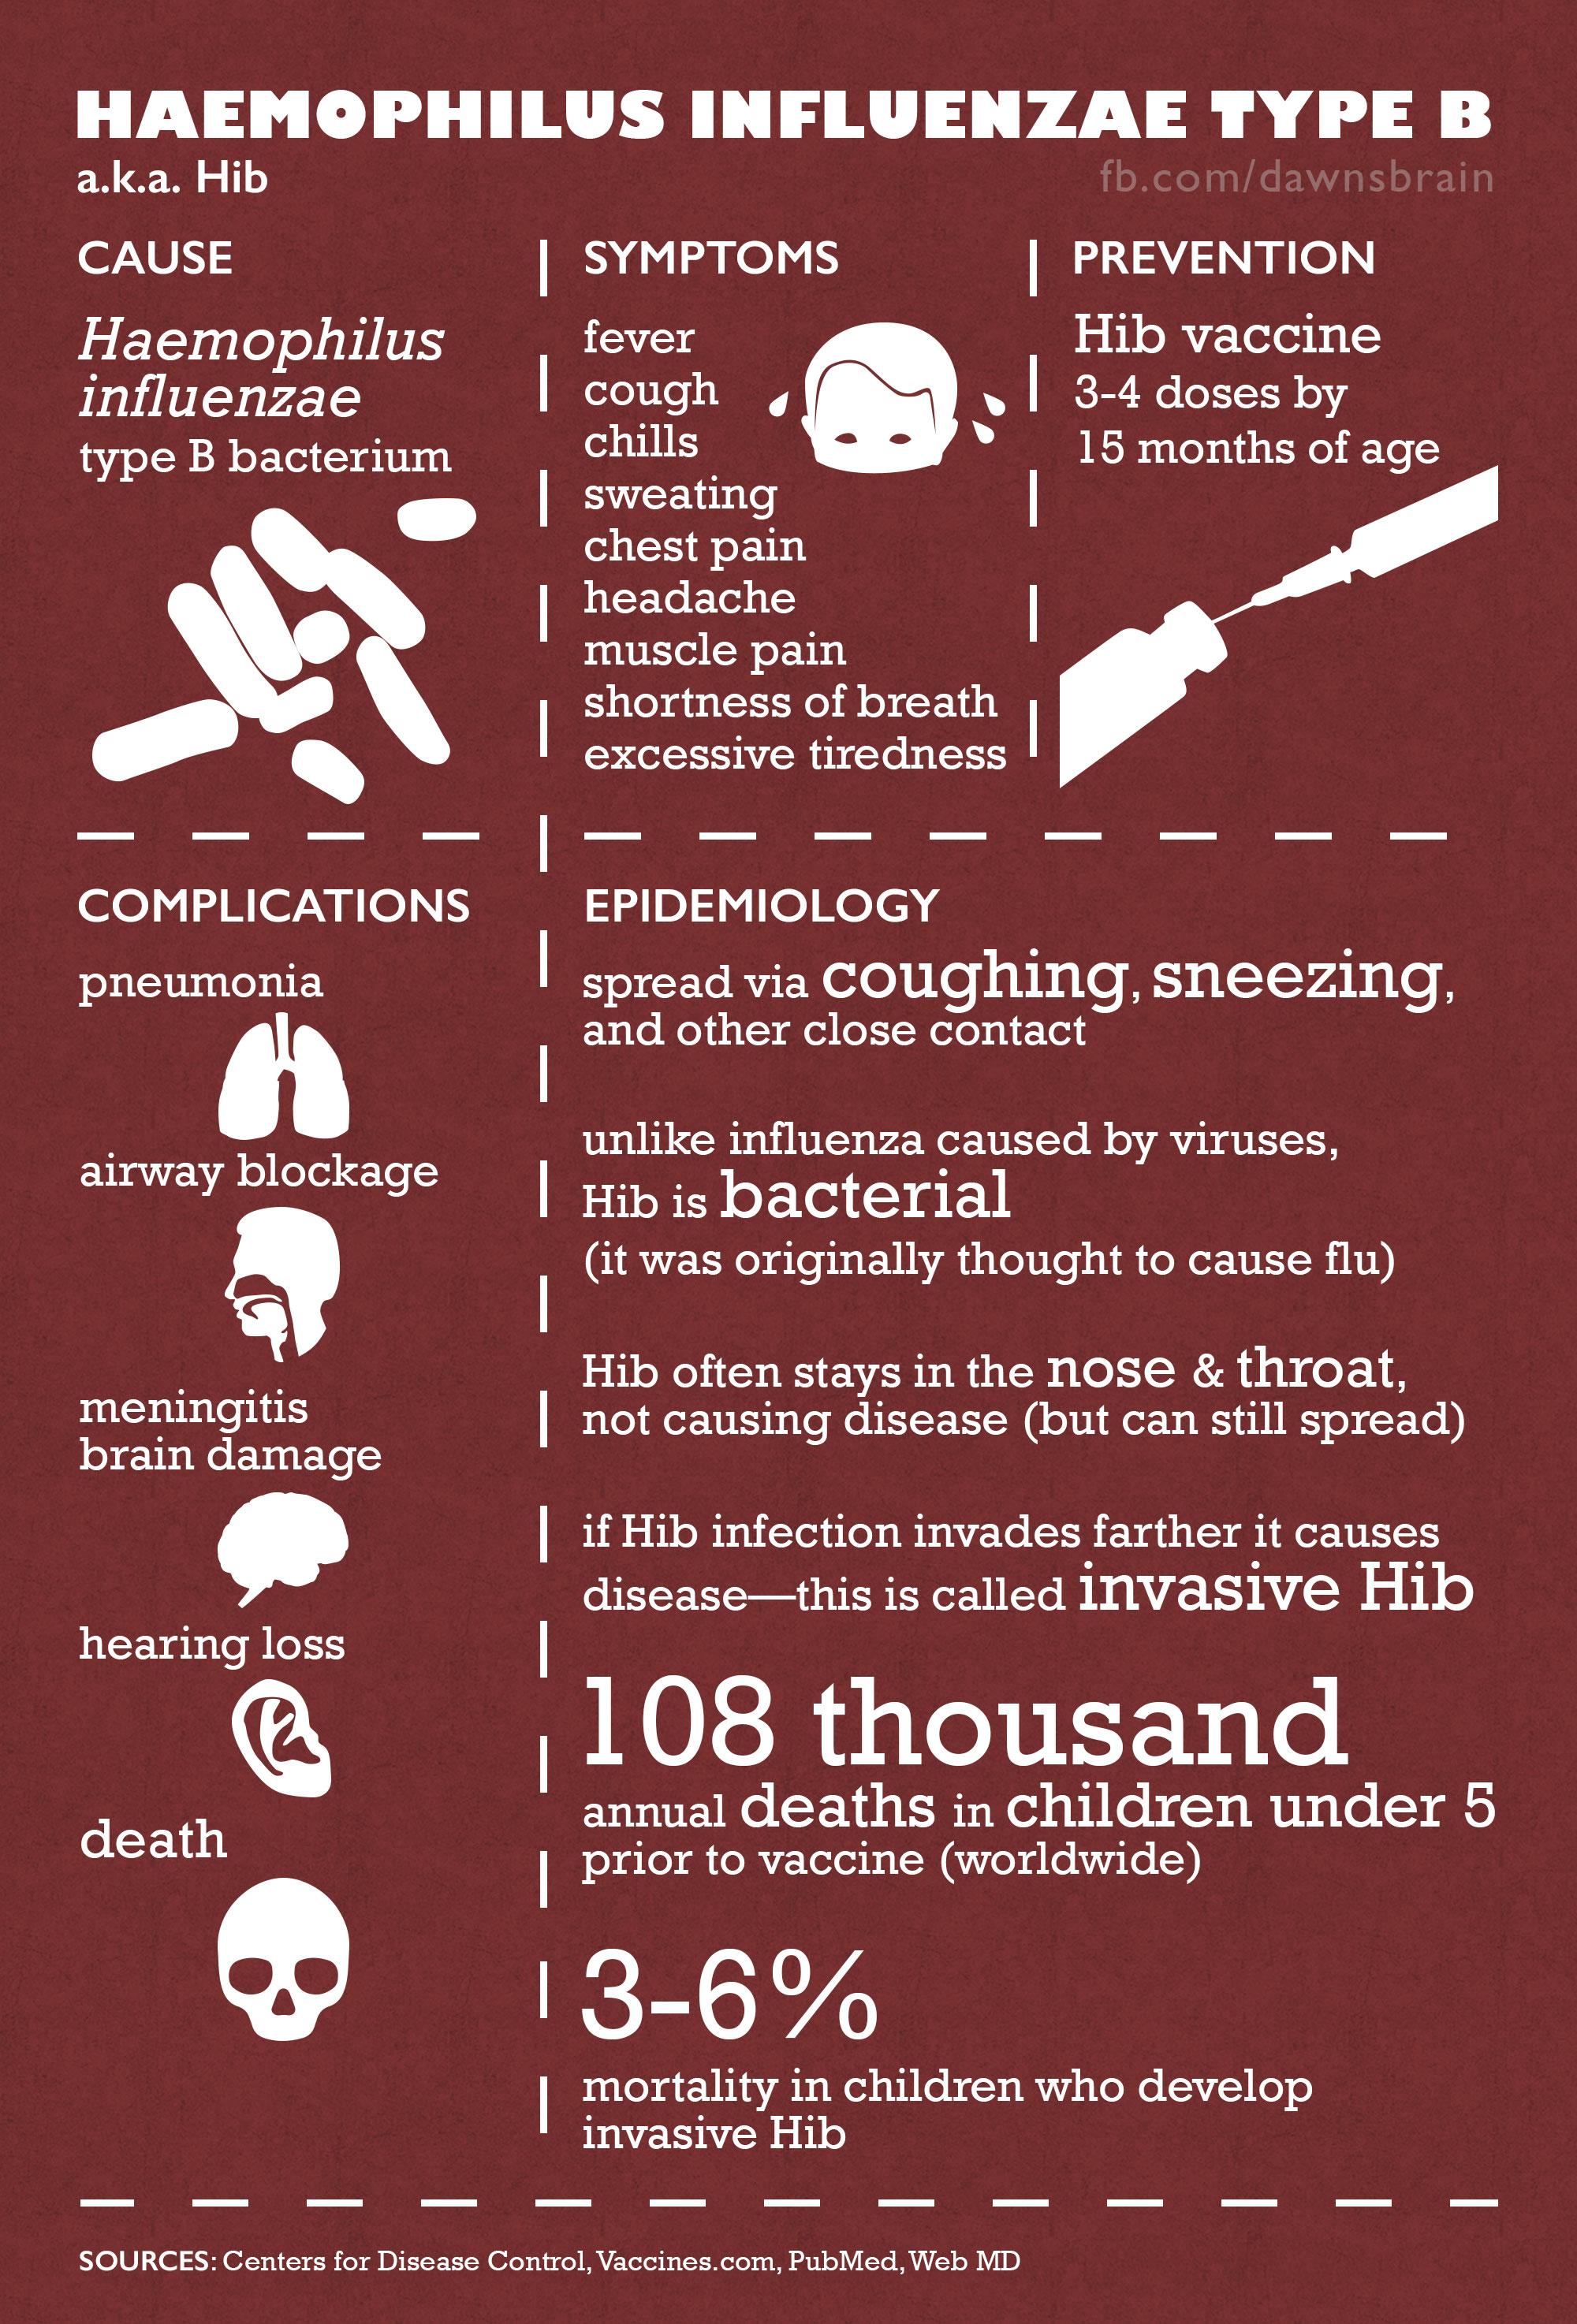 Haemophilus influenzae type B (Hib) Infographic